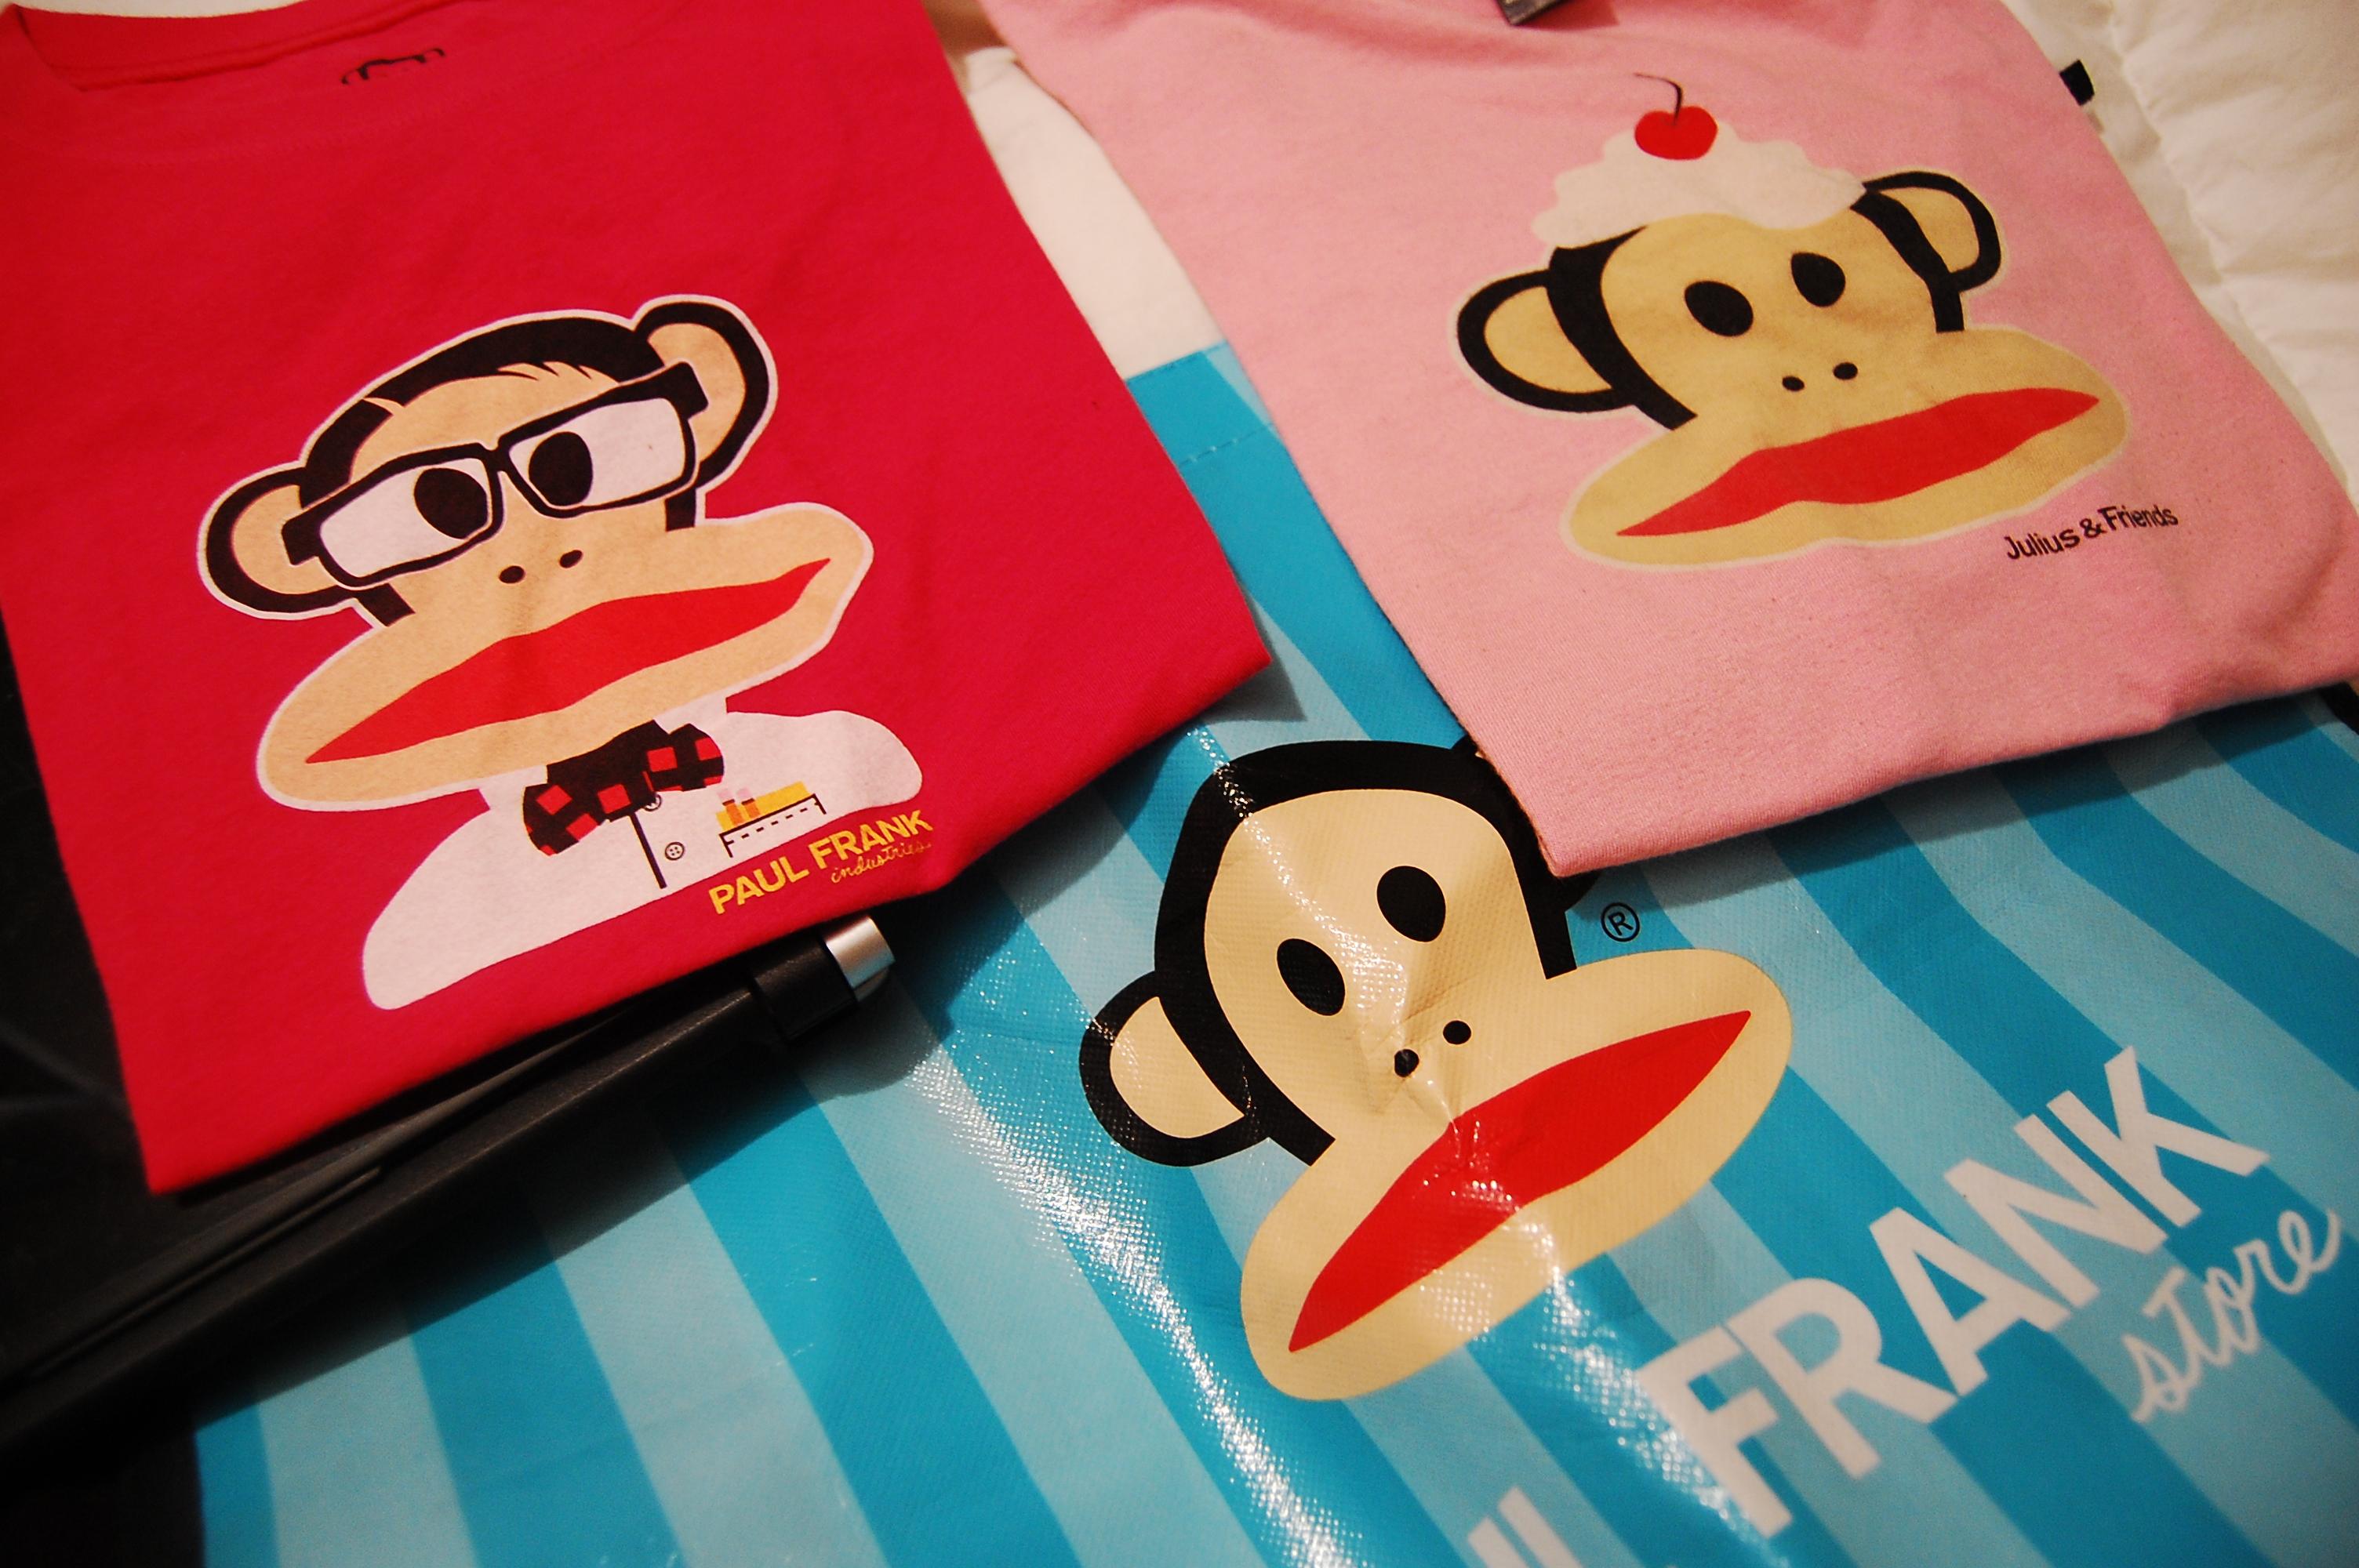 Li Largo Nirvana Hombre Oto/ño Invierno Camiseta de la Roca de Harajuku de impresi/ón su/éter 100/% de algod/ón de la Cadera Calle Ropa al Aire Libre Escudo Hop de Manga Larga